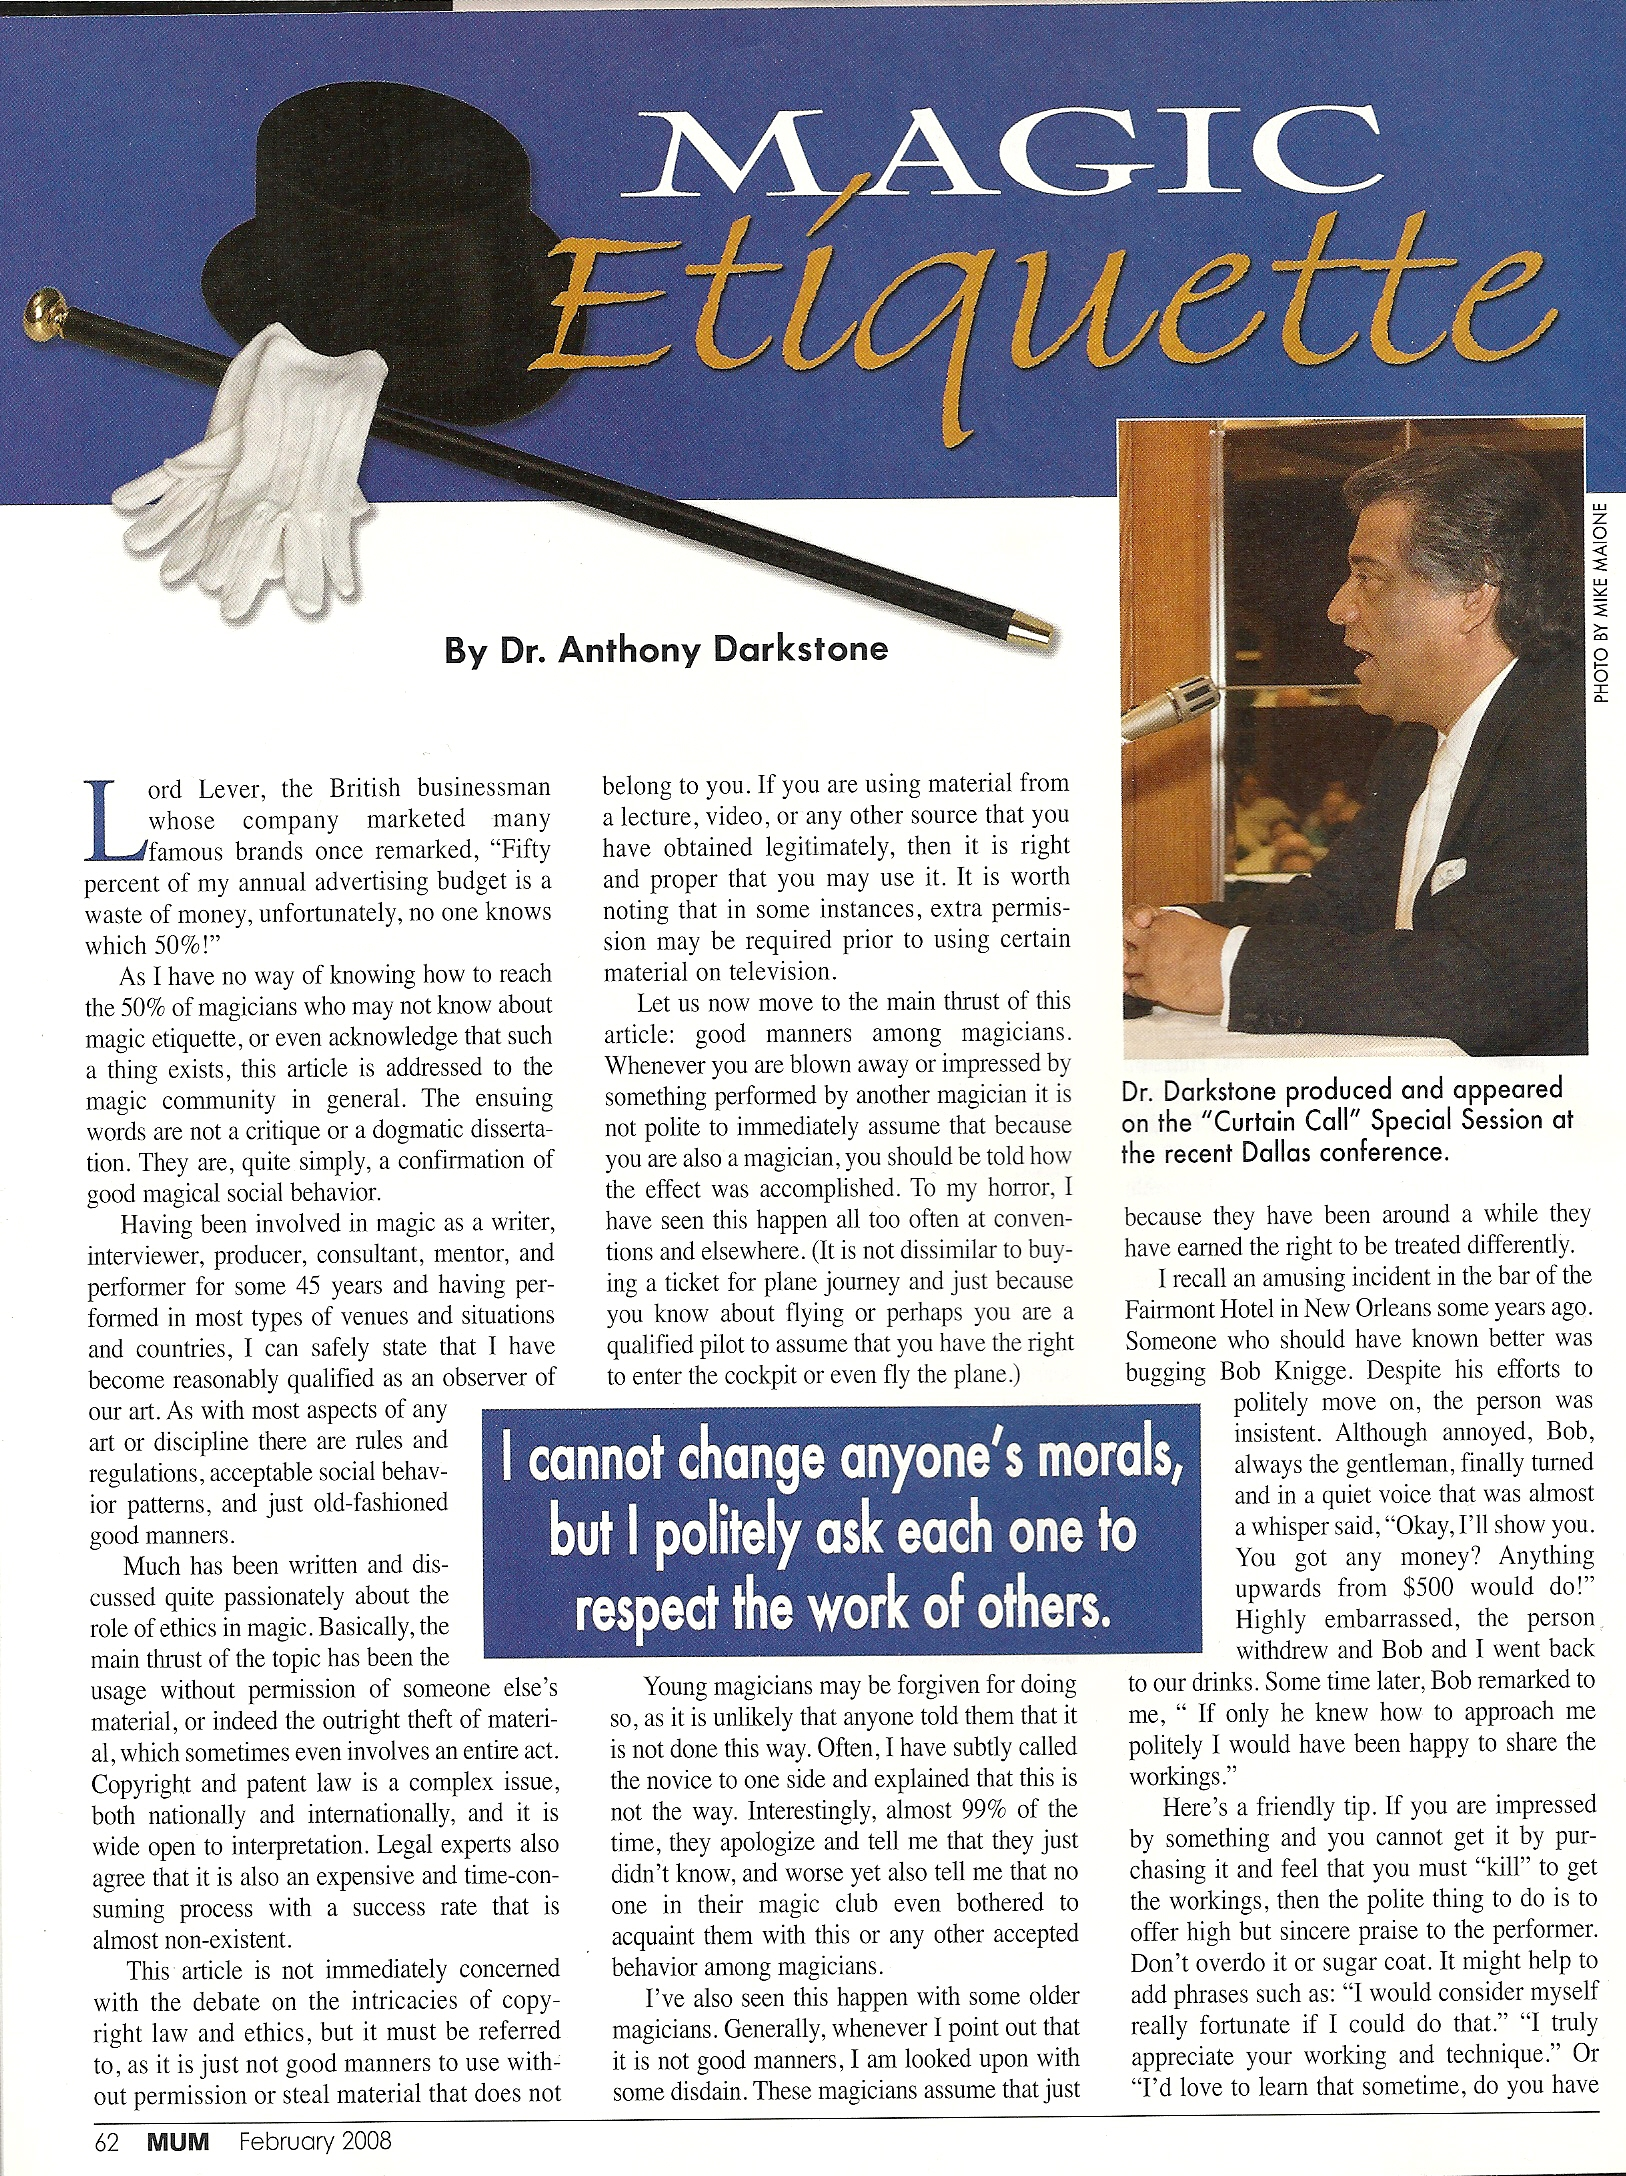 MUM Magazine Feb 2008 Magic Eriquette by Dr Anthony Darkstone